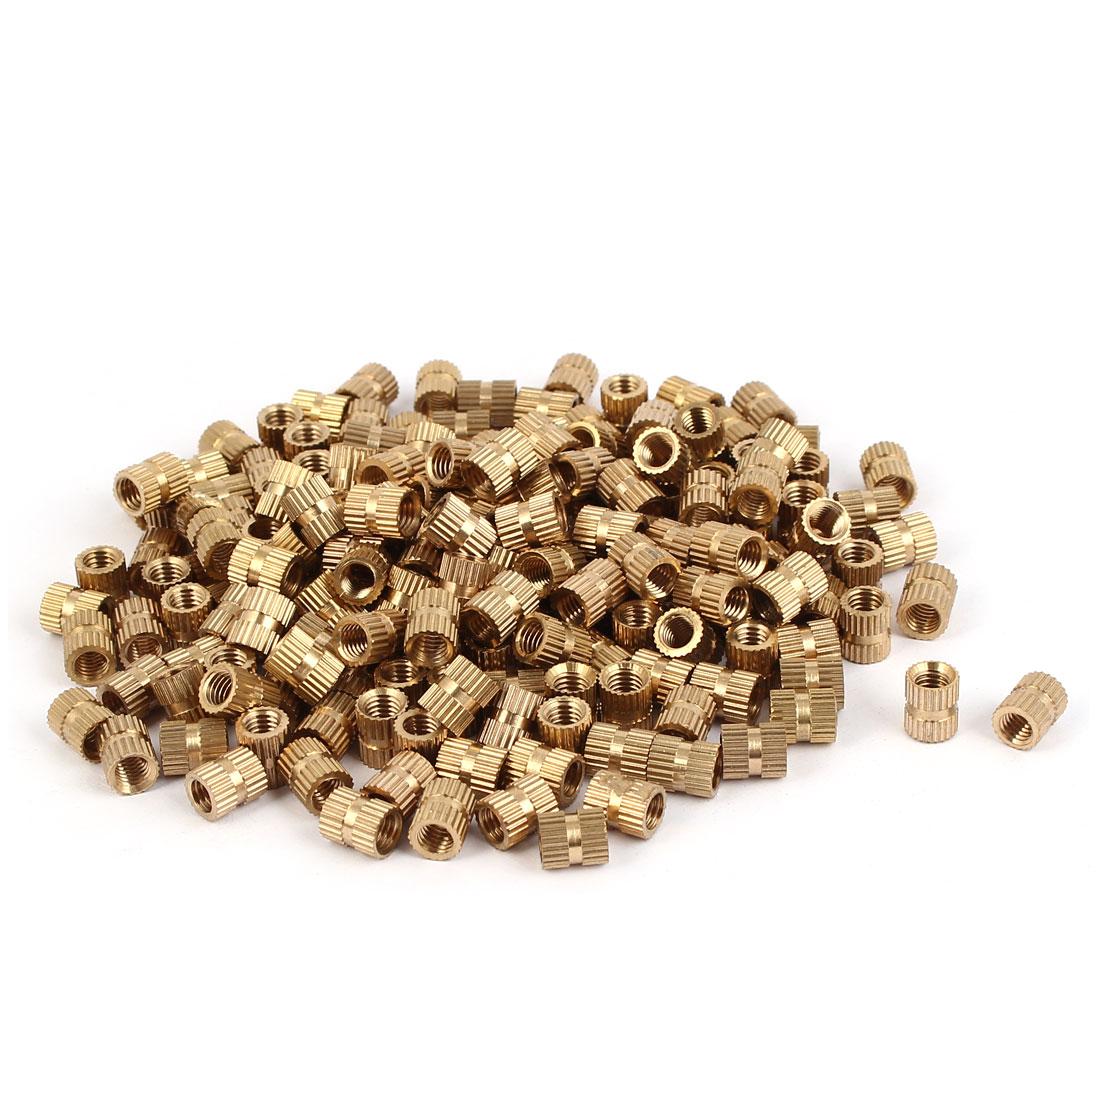 M5 x 8mm x 6.8mm Brass Cylinder Knurled Threaded Insert Embedment Nuts 200PCS